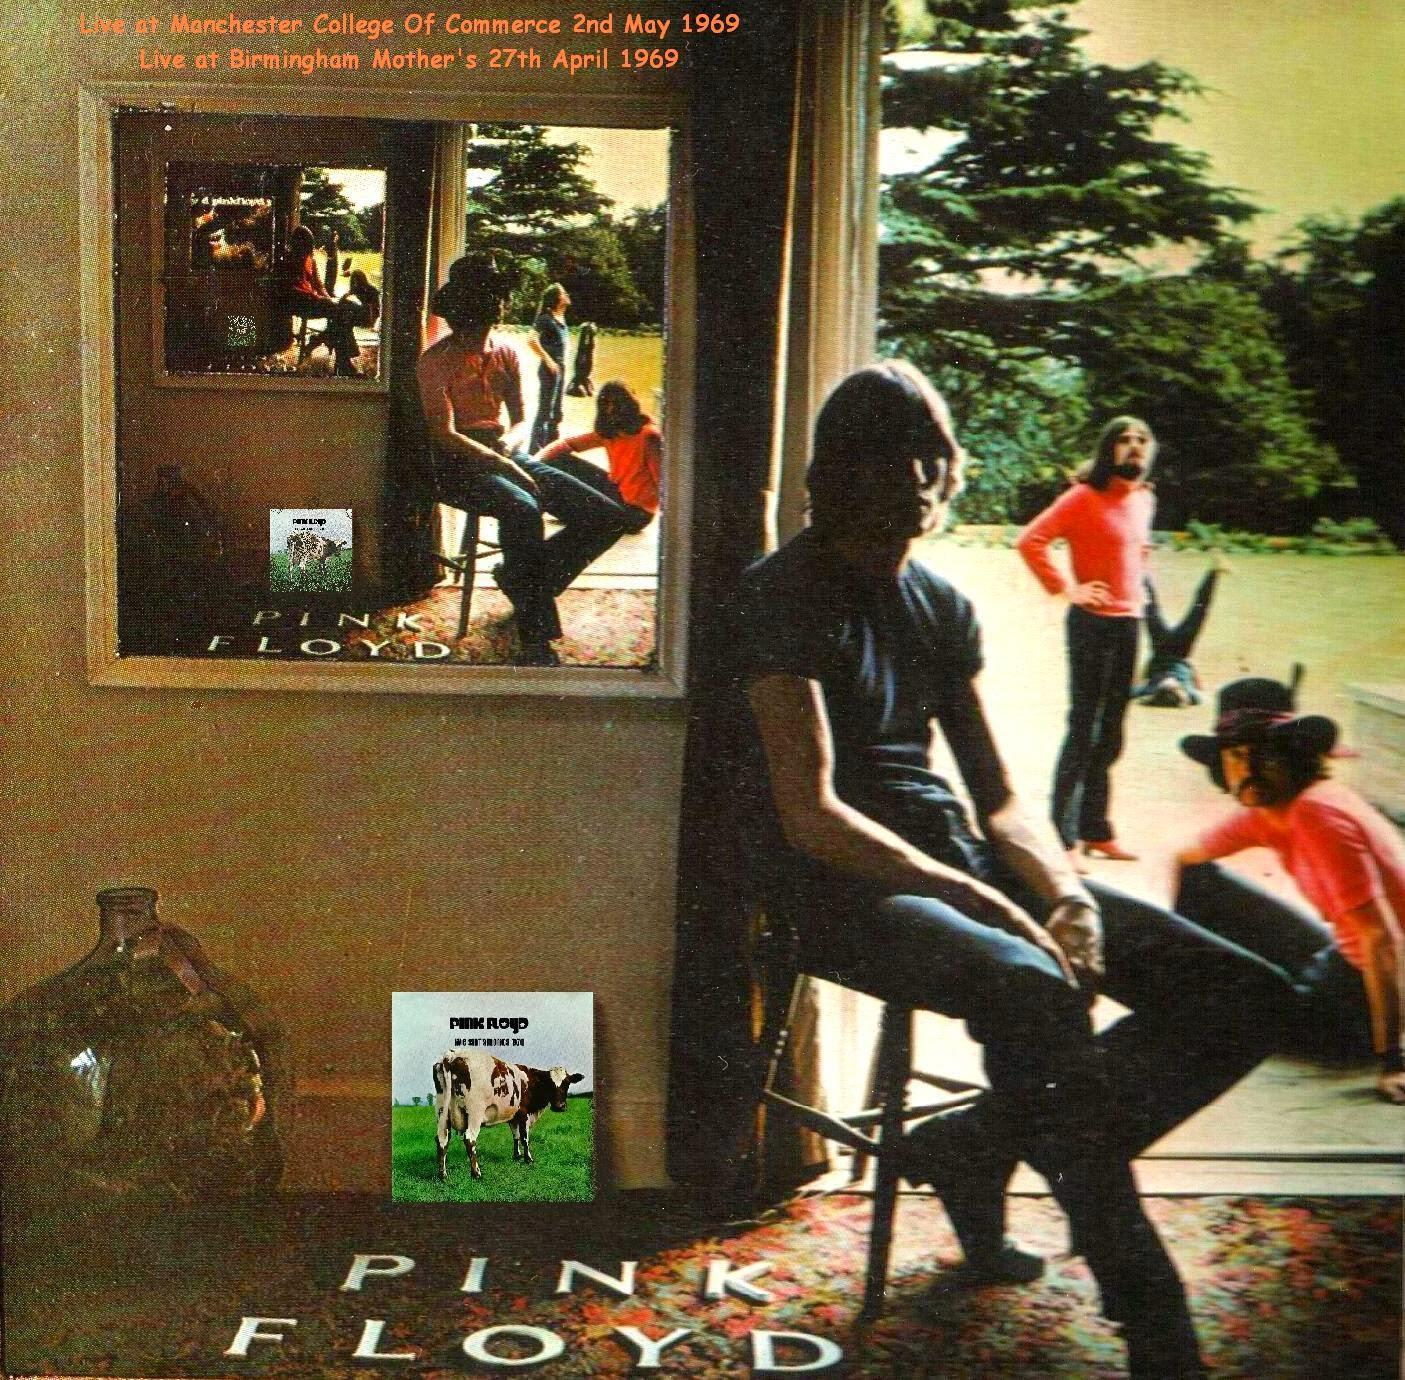 Pink Floyd - Ummagumma Live Album